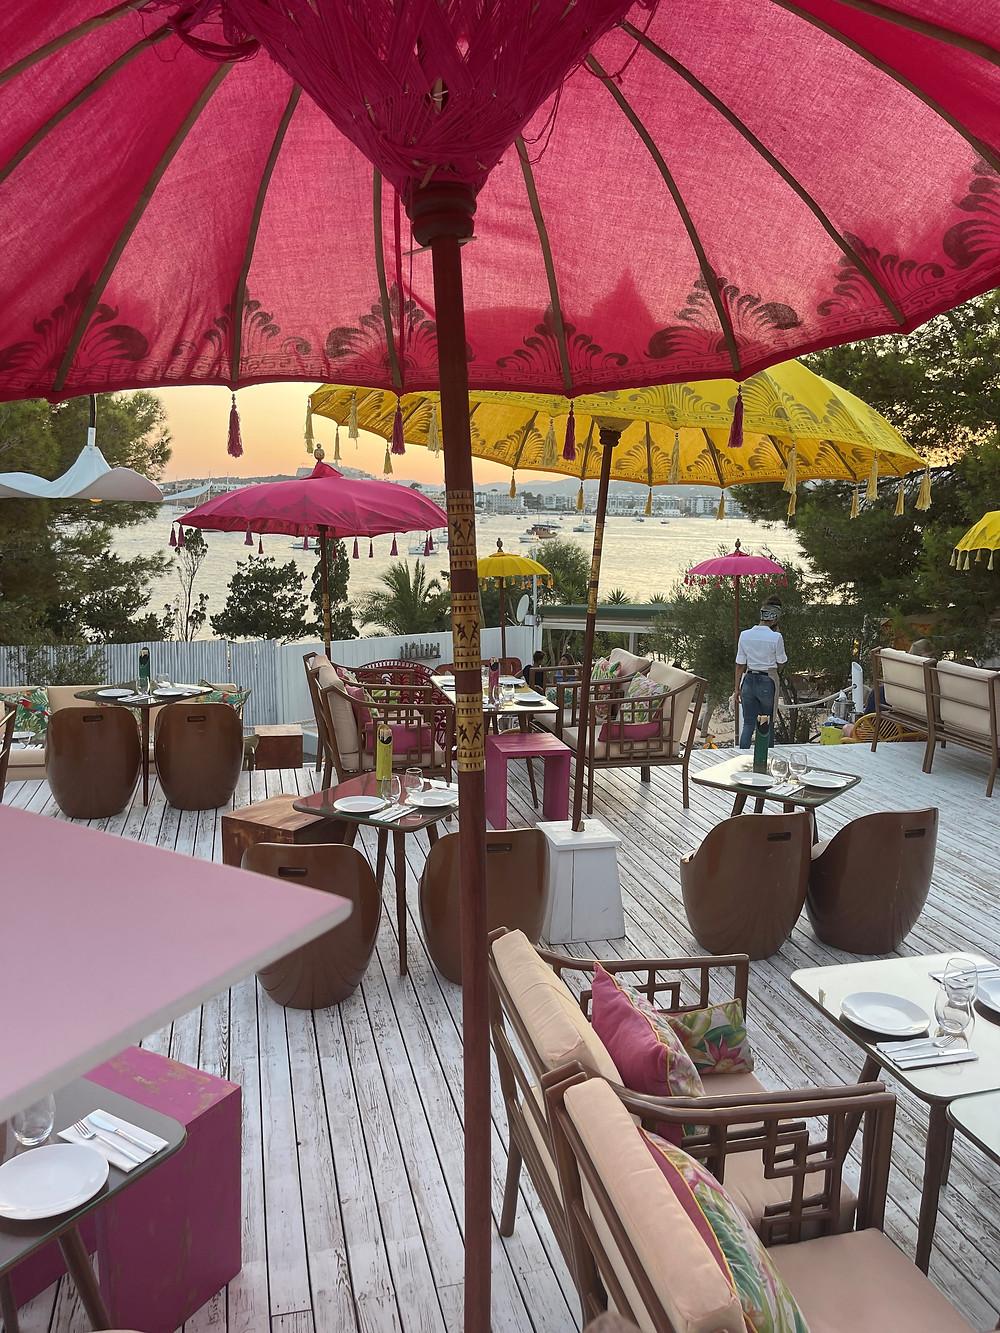 Ginger Restaurant on the edge of Talamanca